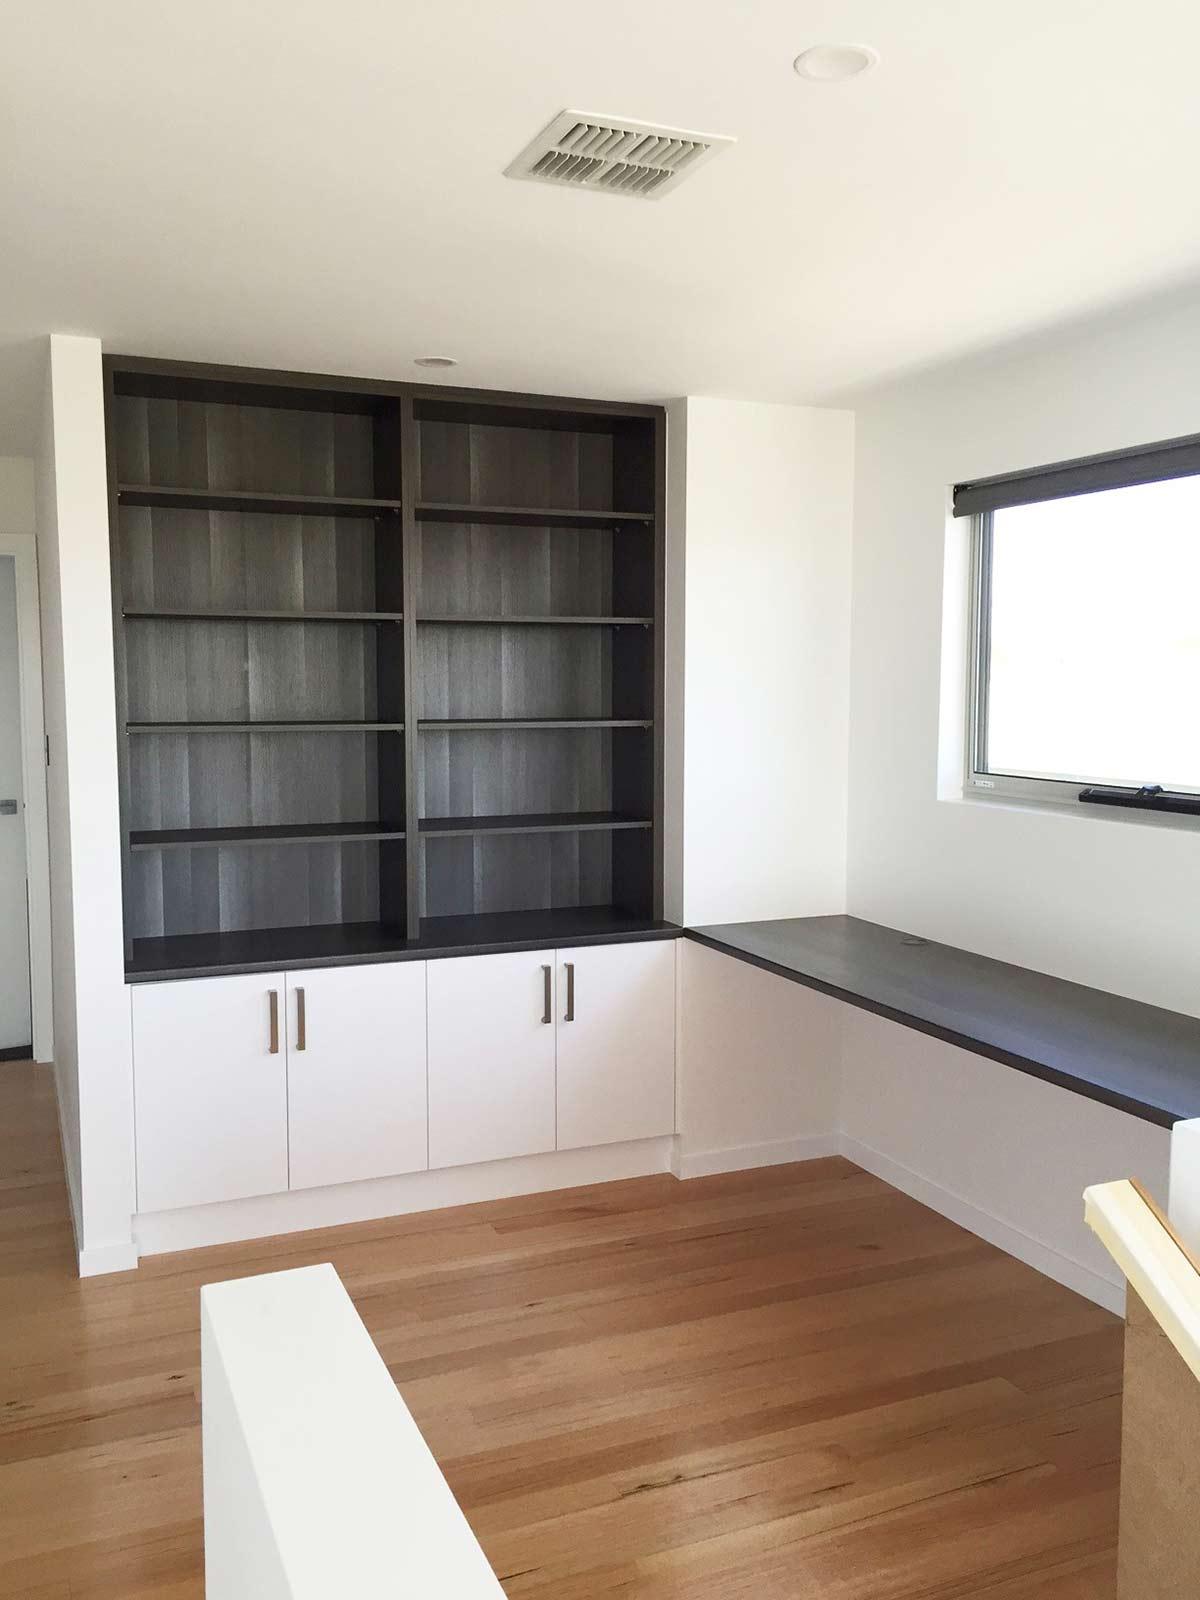 joinerydotcom bookshelf